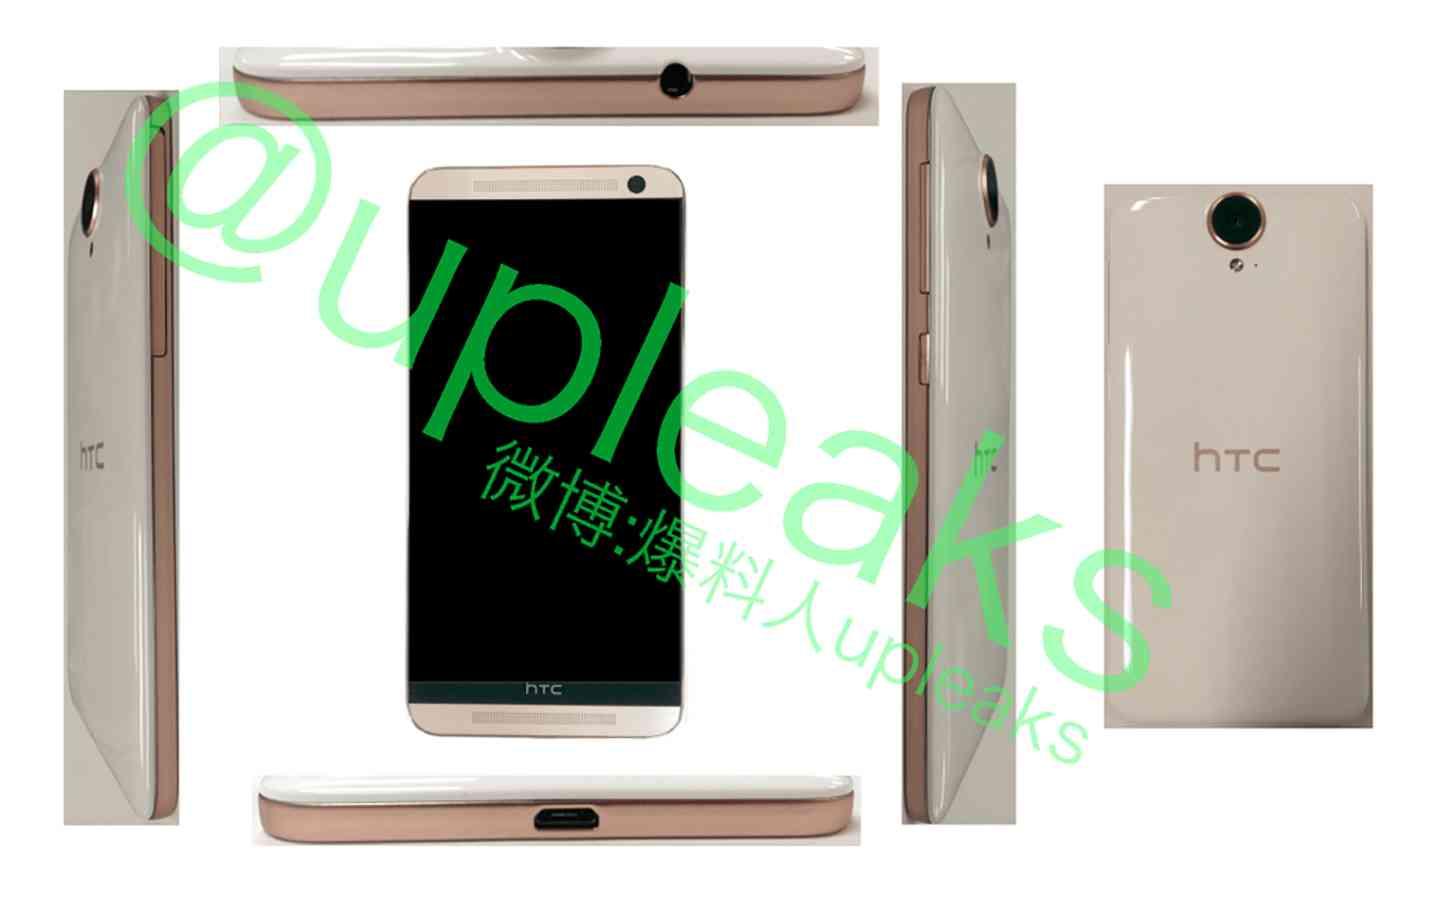 HTC One E9 image leak